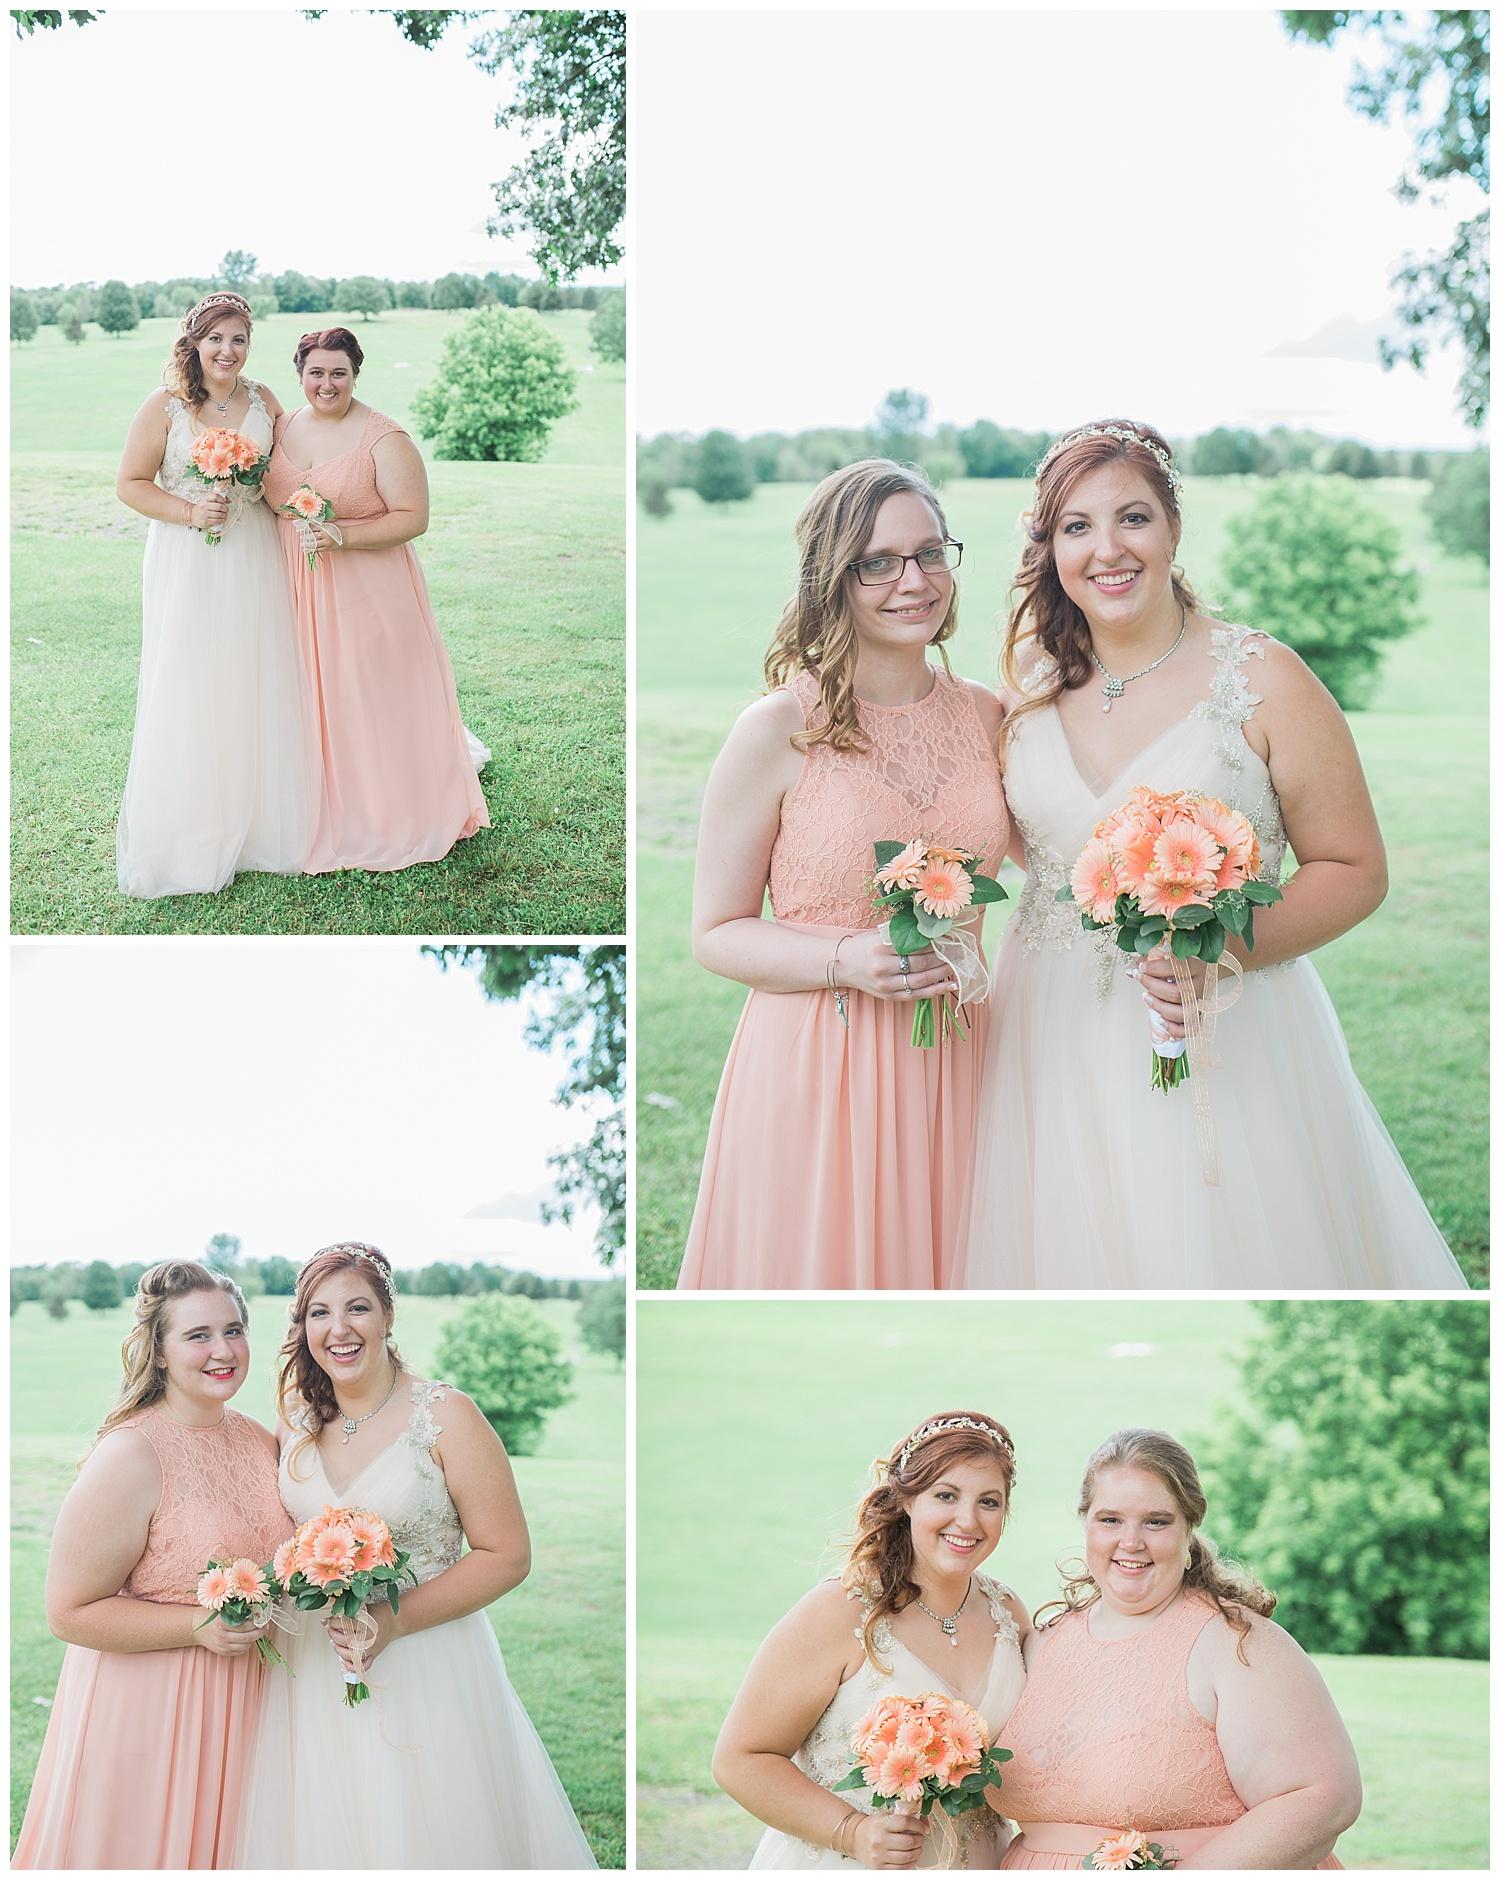 Brian and Molly Wed in Conesus NY - Lass & Beau-614_Buffalo wedding photography.jpg